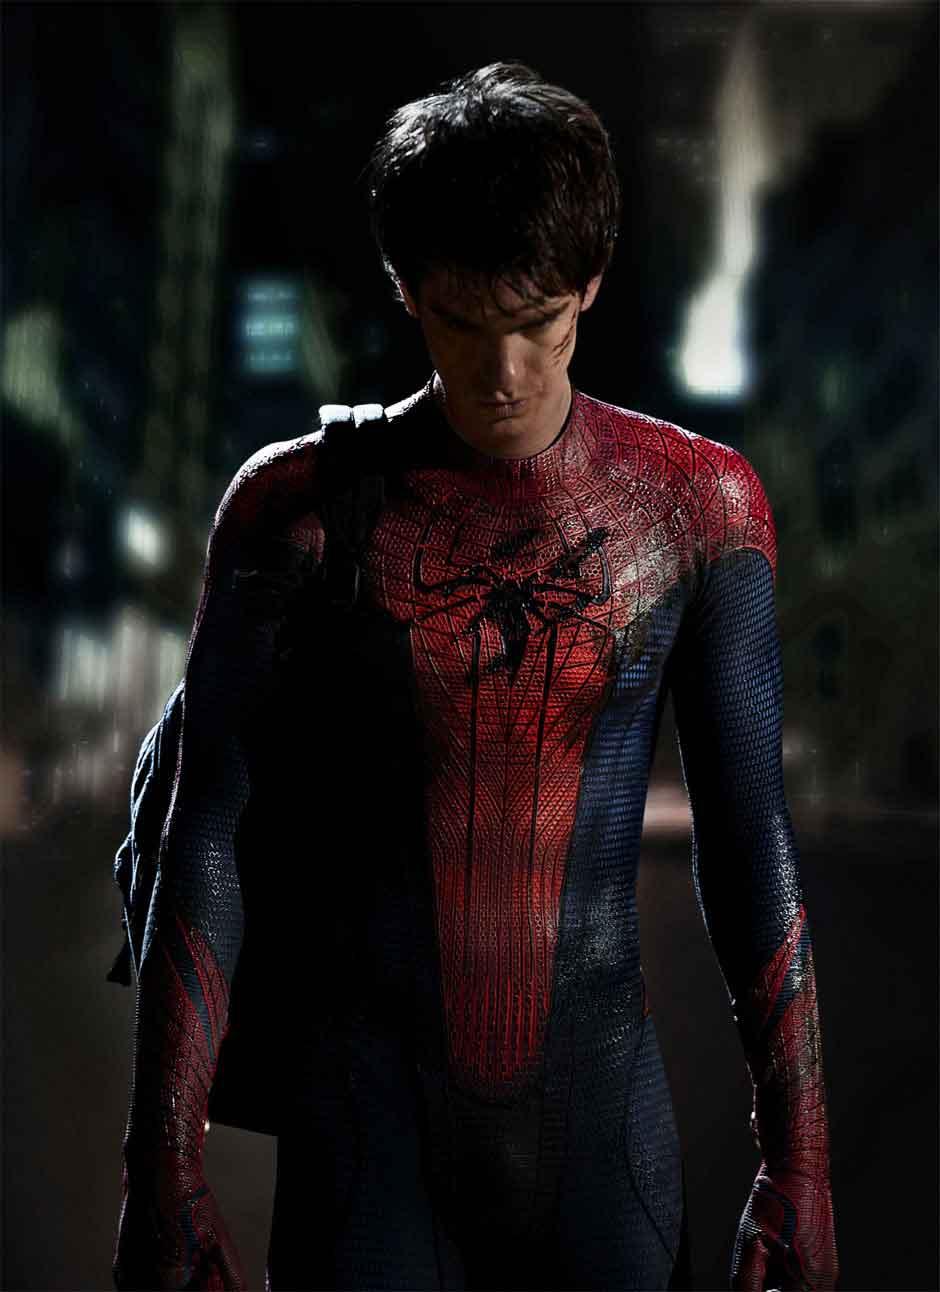 garfield uniforme homem aranha